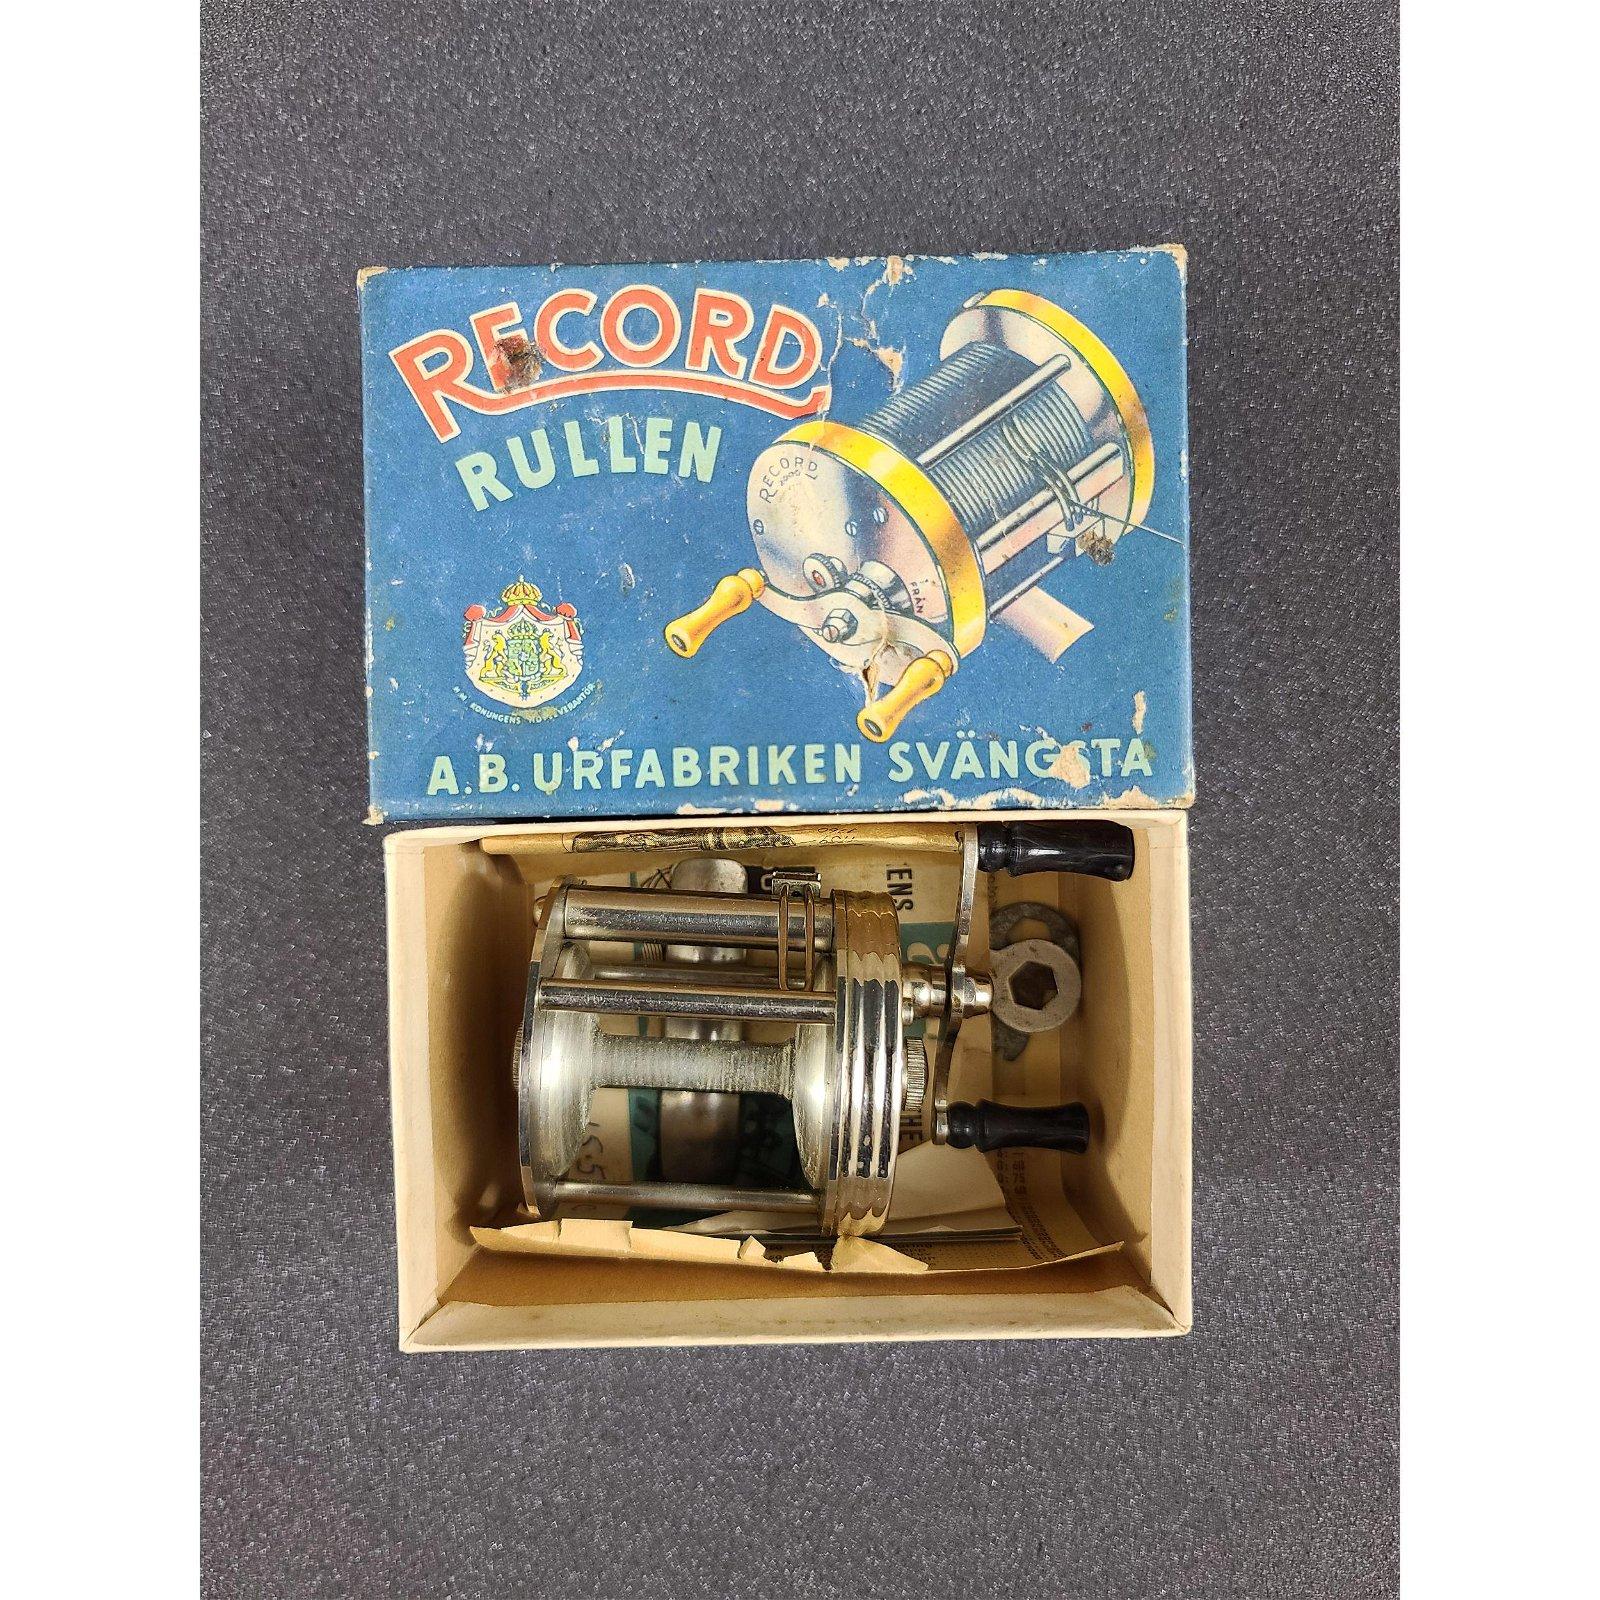 Vintage Fishing Reel Record NO 1550 Model C